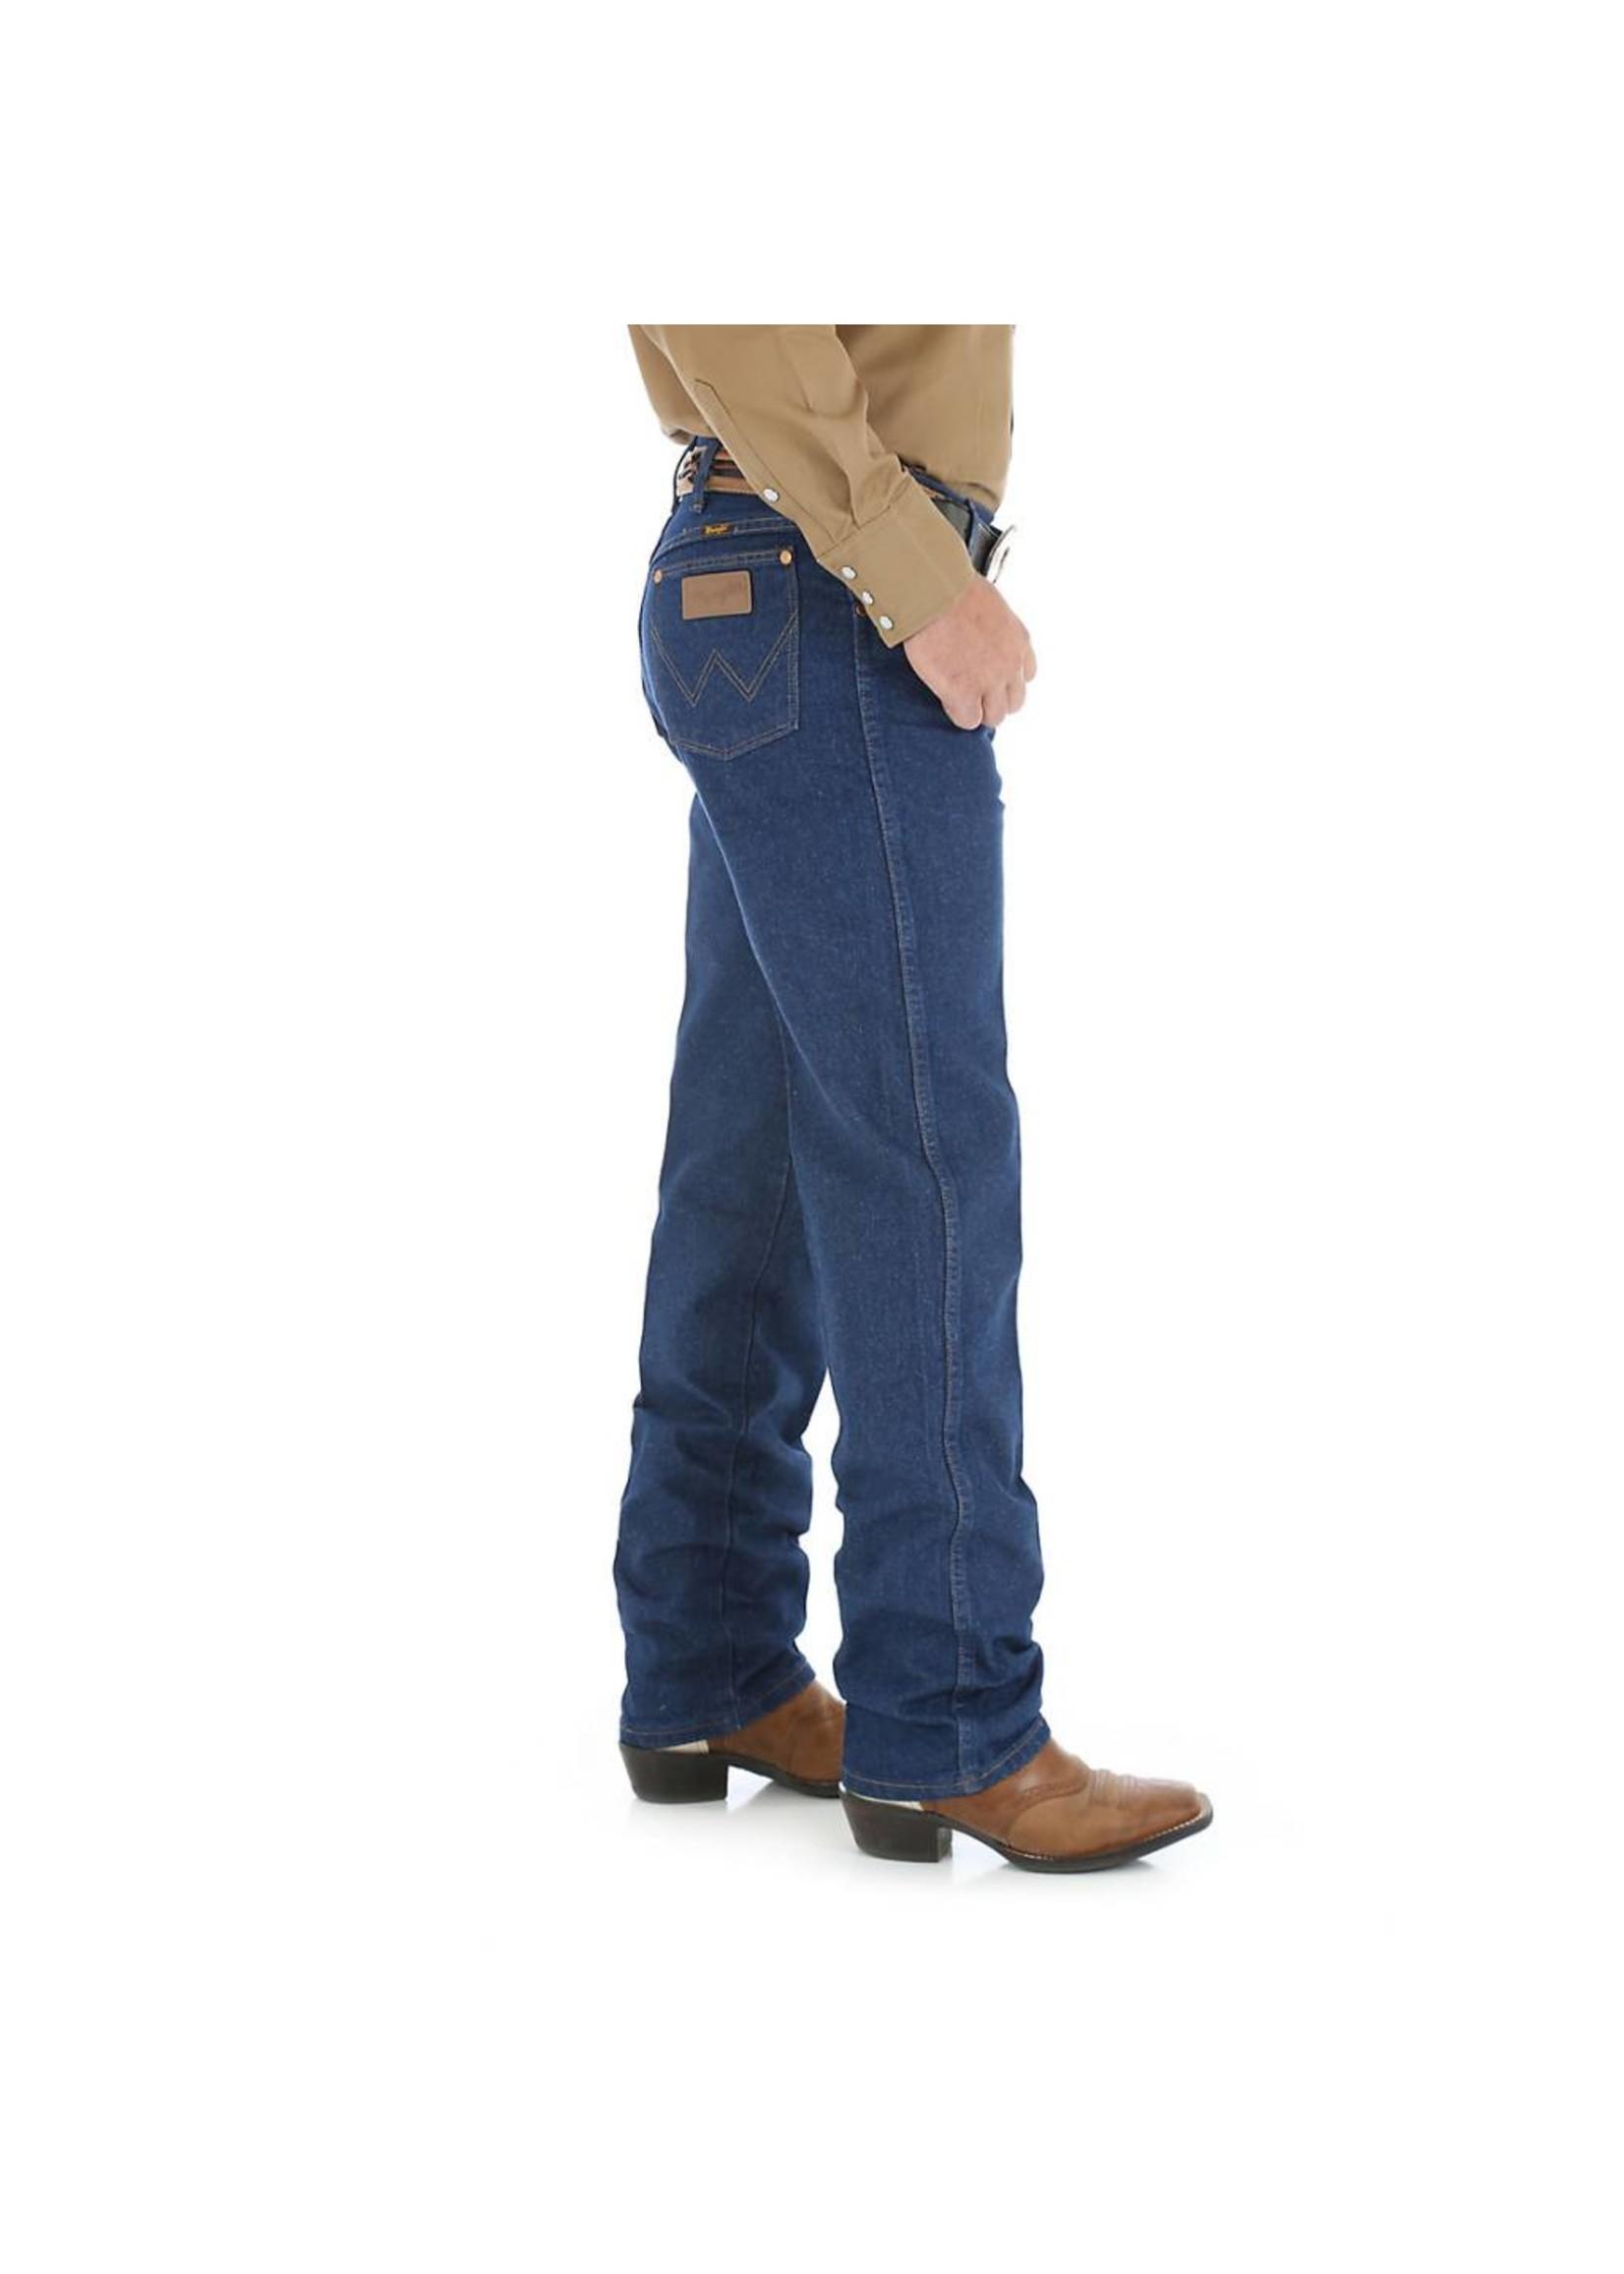 Wrangler COWBOY CUT® ORIGINAL FIT JEAN 13MWZPW